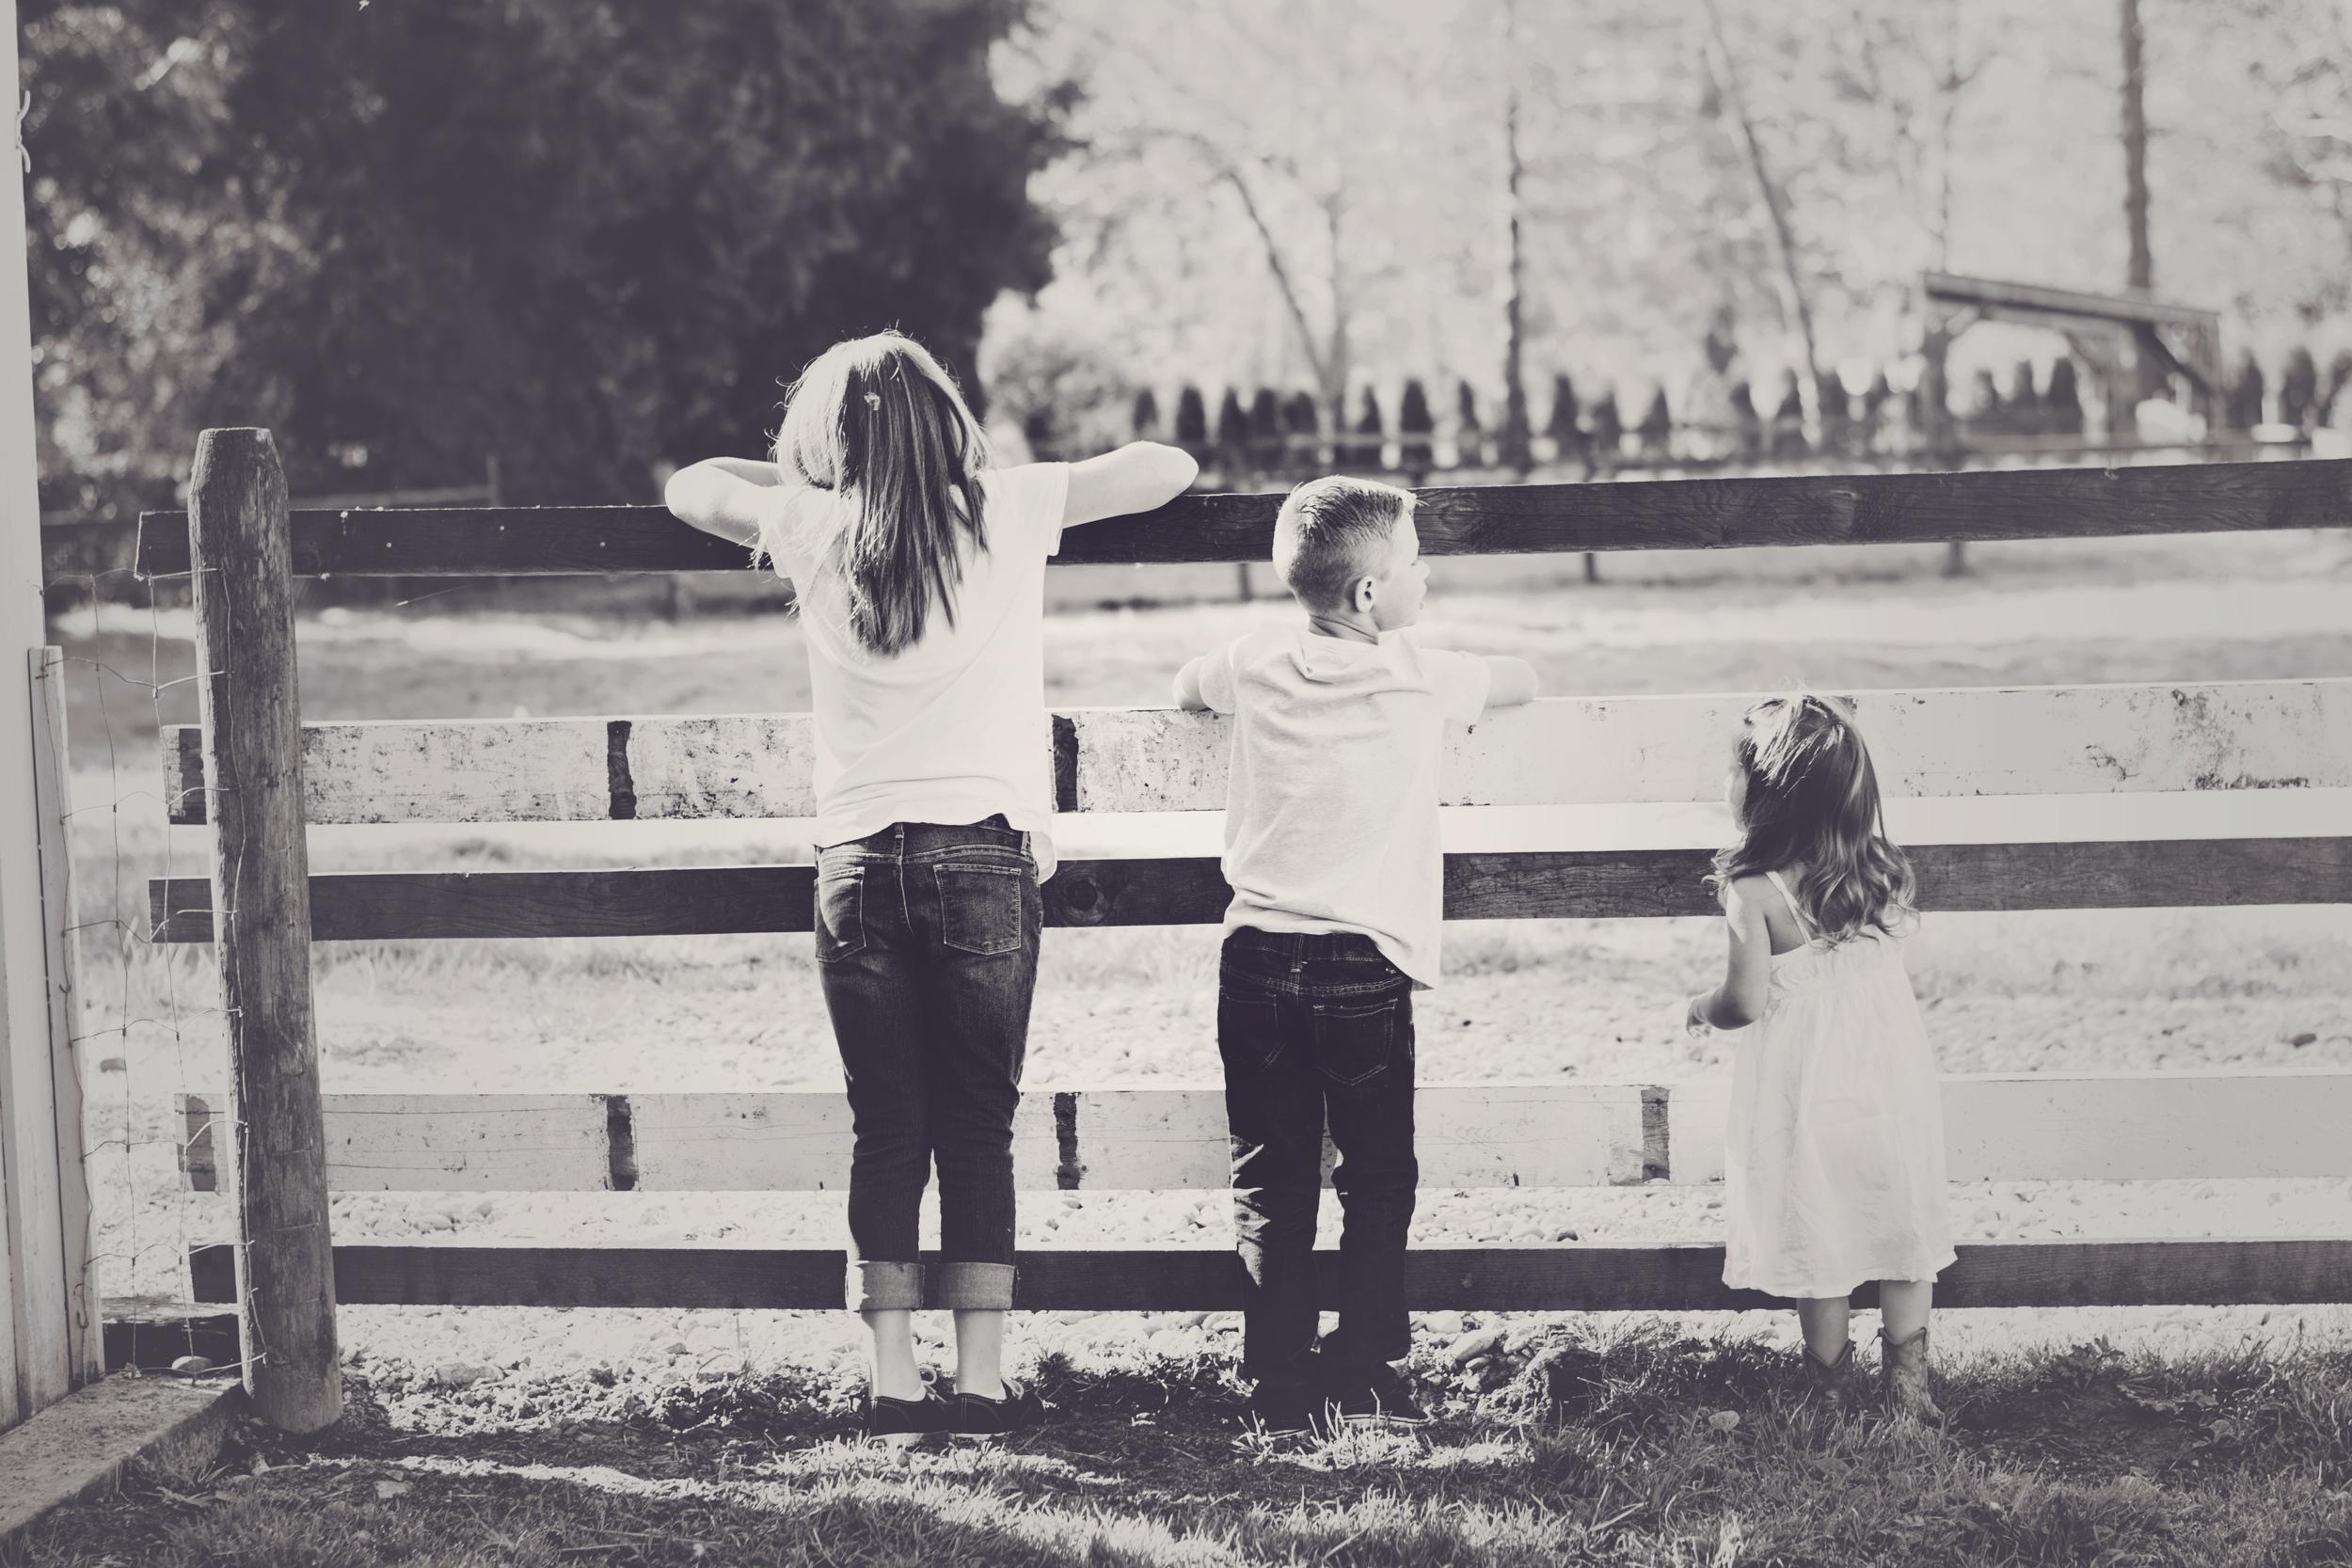 Siblings on the farm